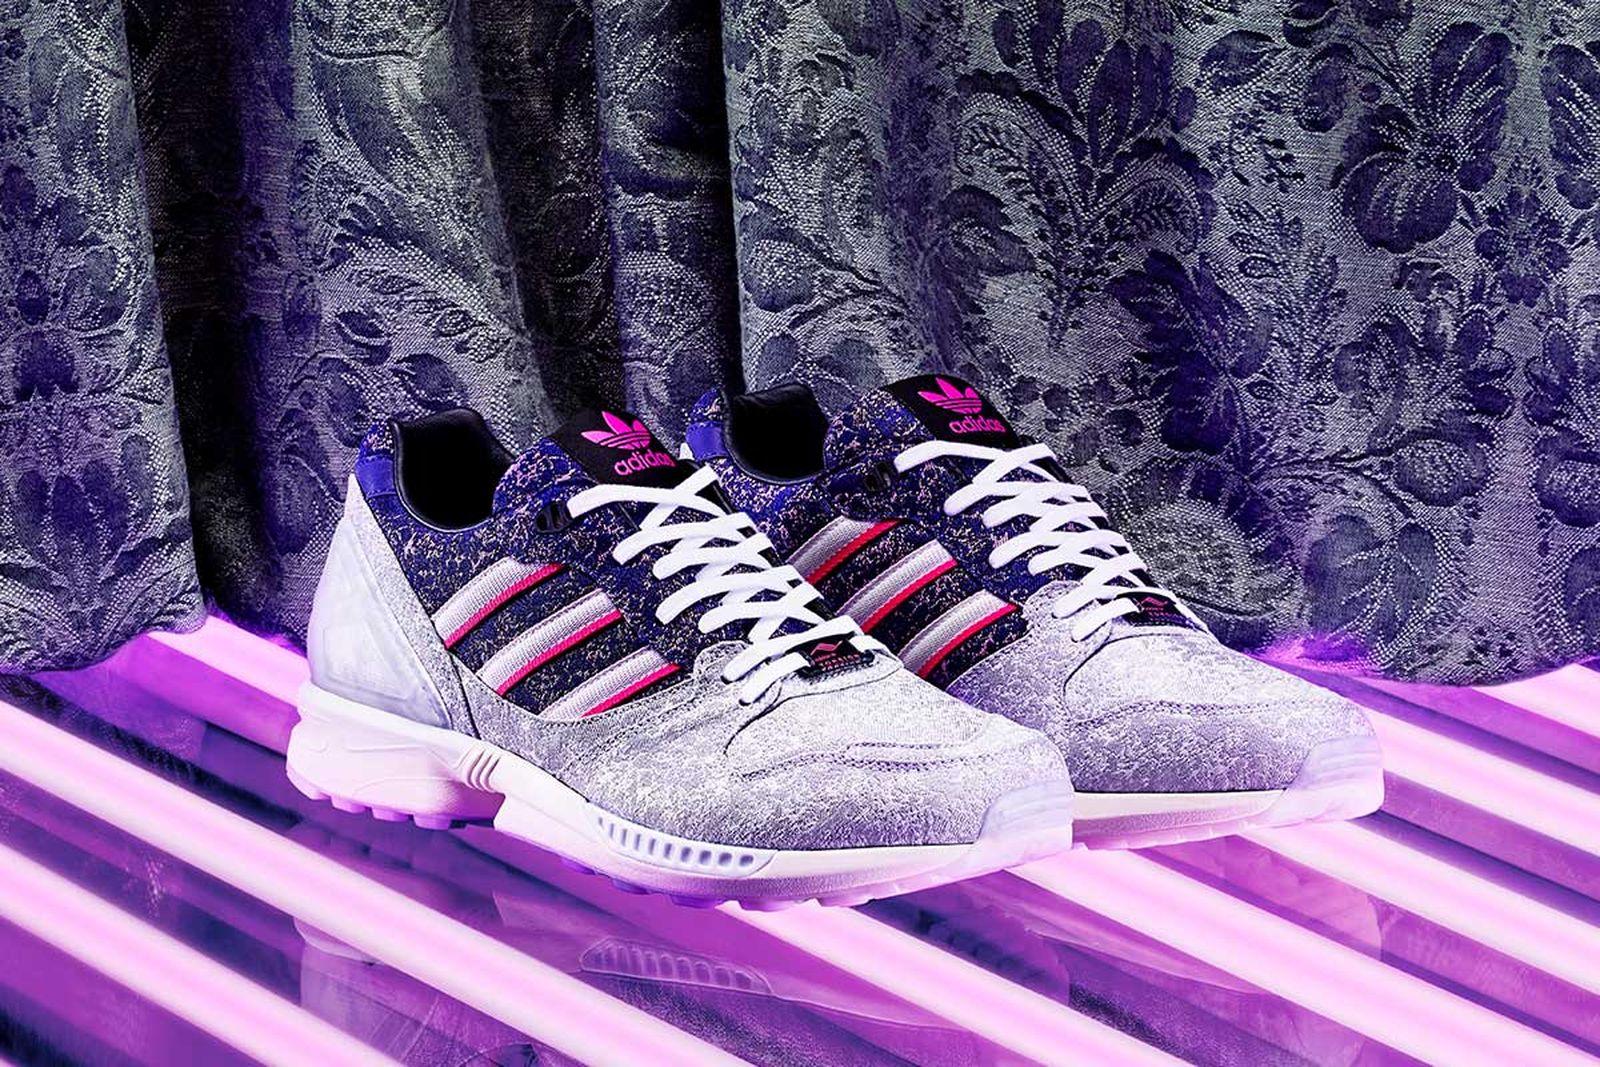 adidas-zx-5000-vieuz-lyon-release-date-price-01